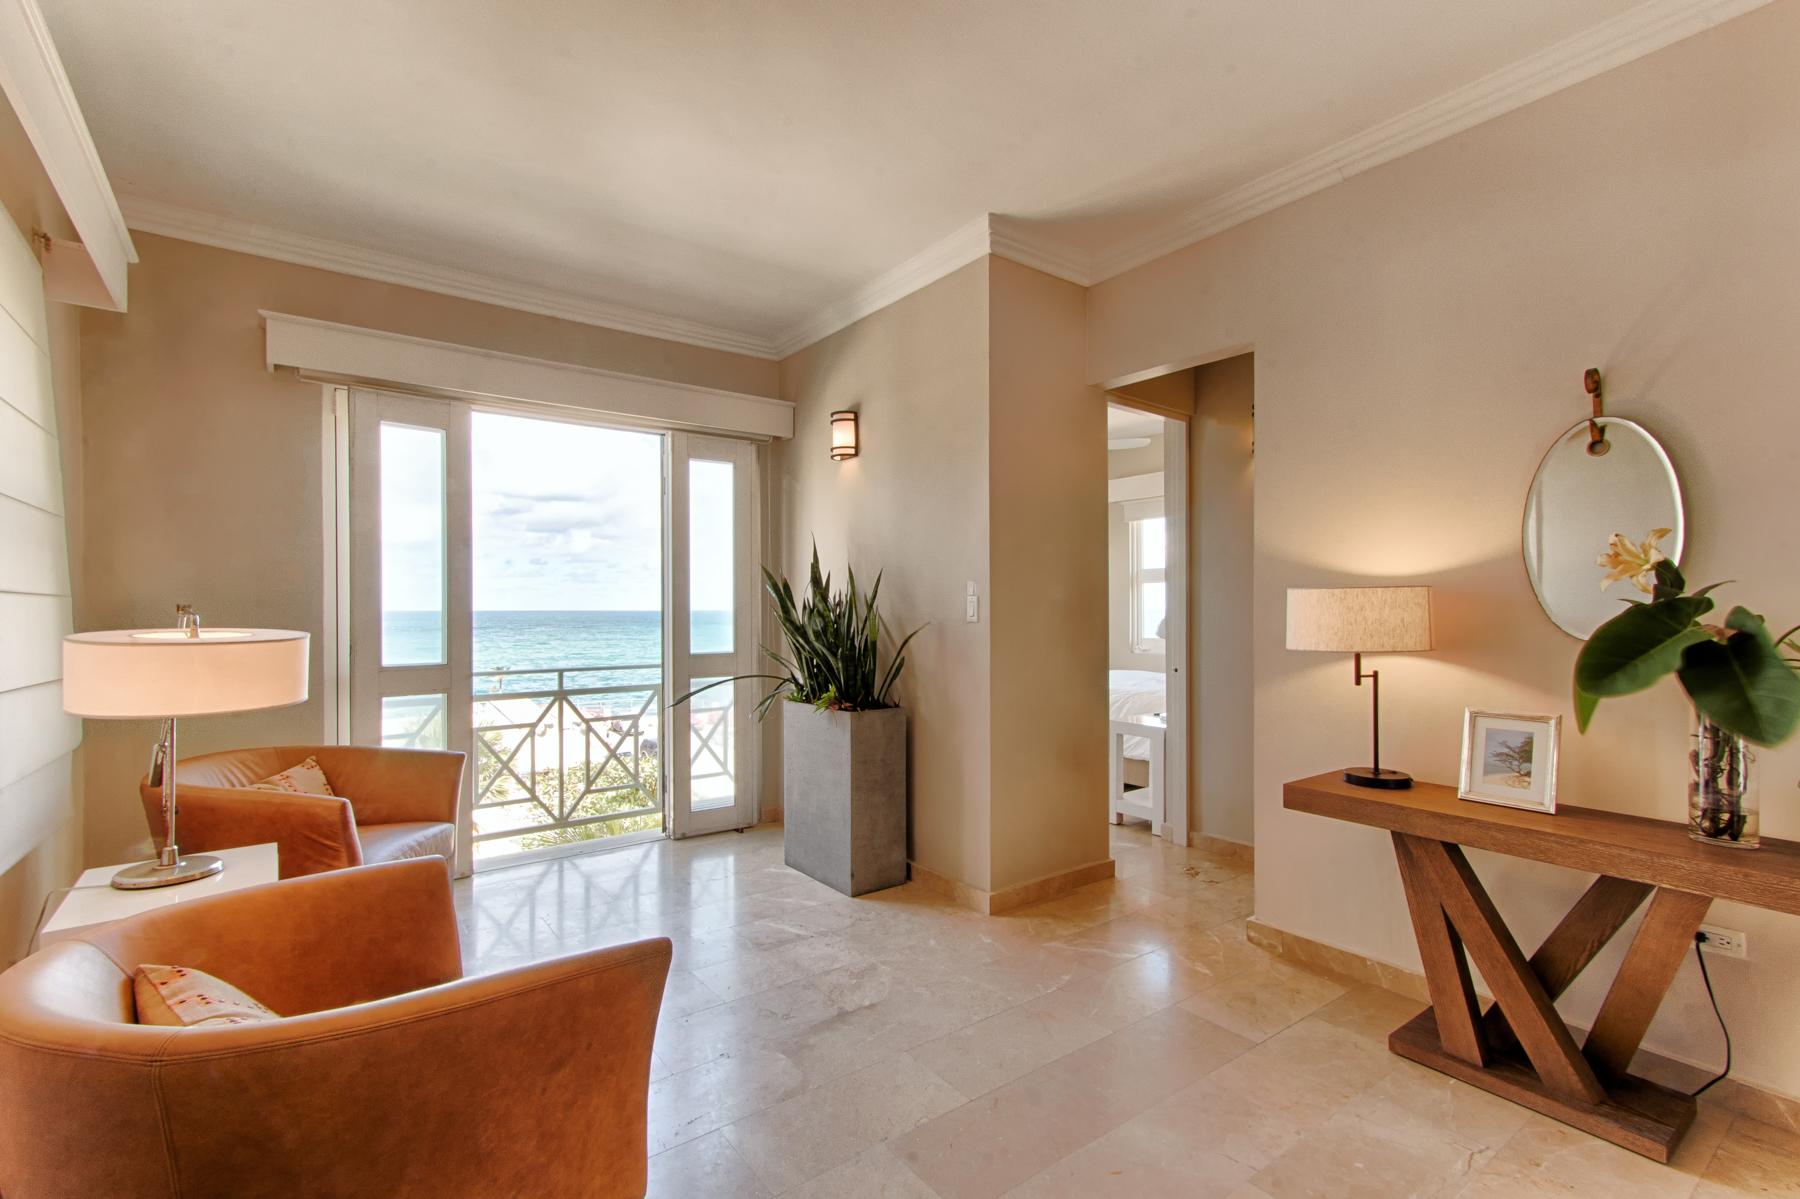 Condominium for Rent at 876 Ashford Valencia Apt. 402 Condado Beach San Juan, Puerto Rico 00907 Puerto Rico